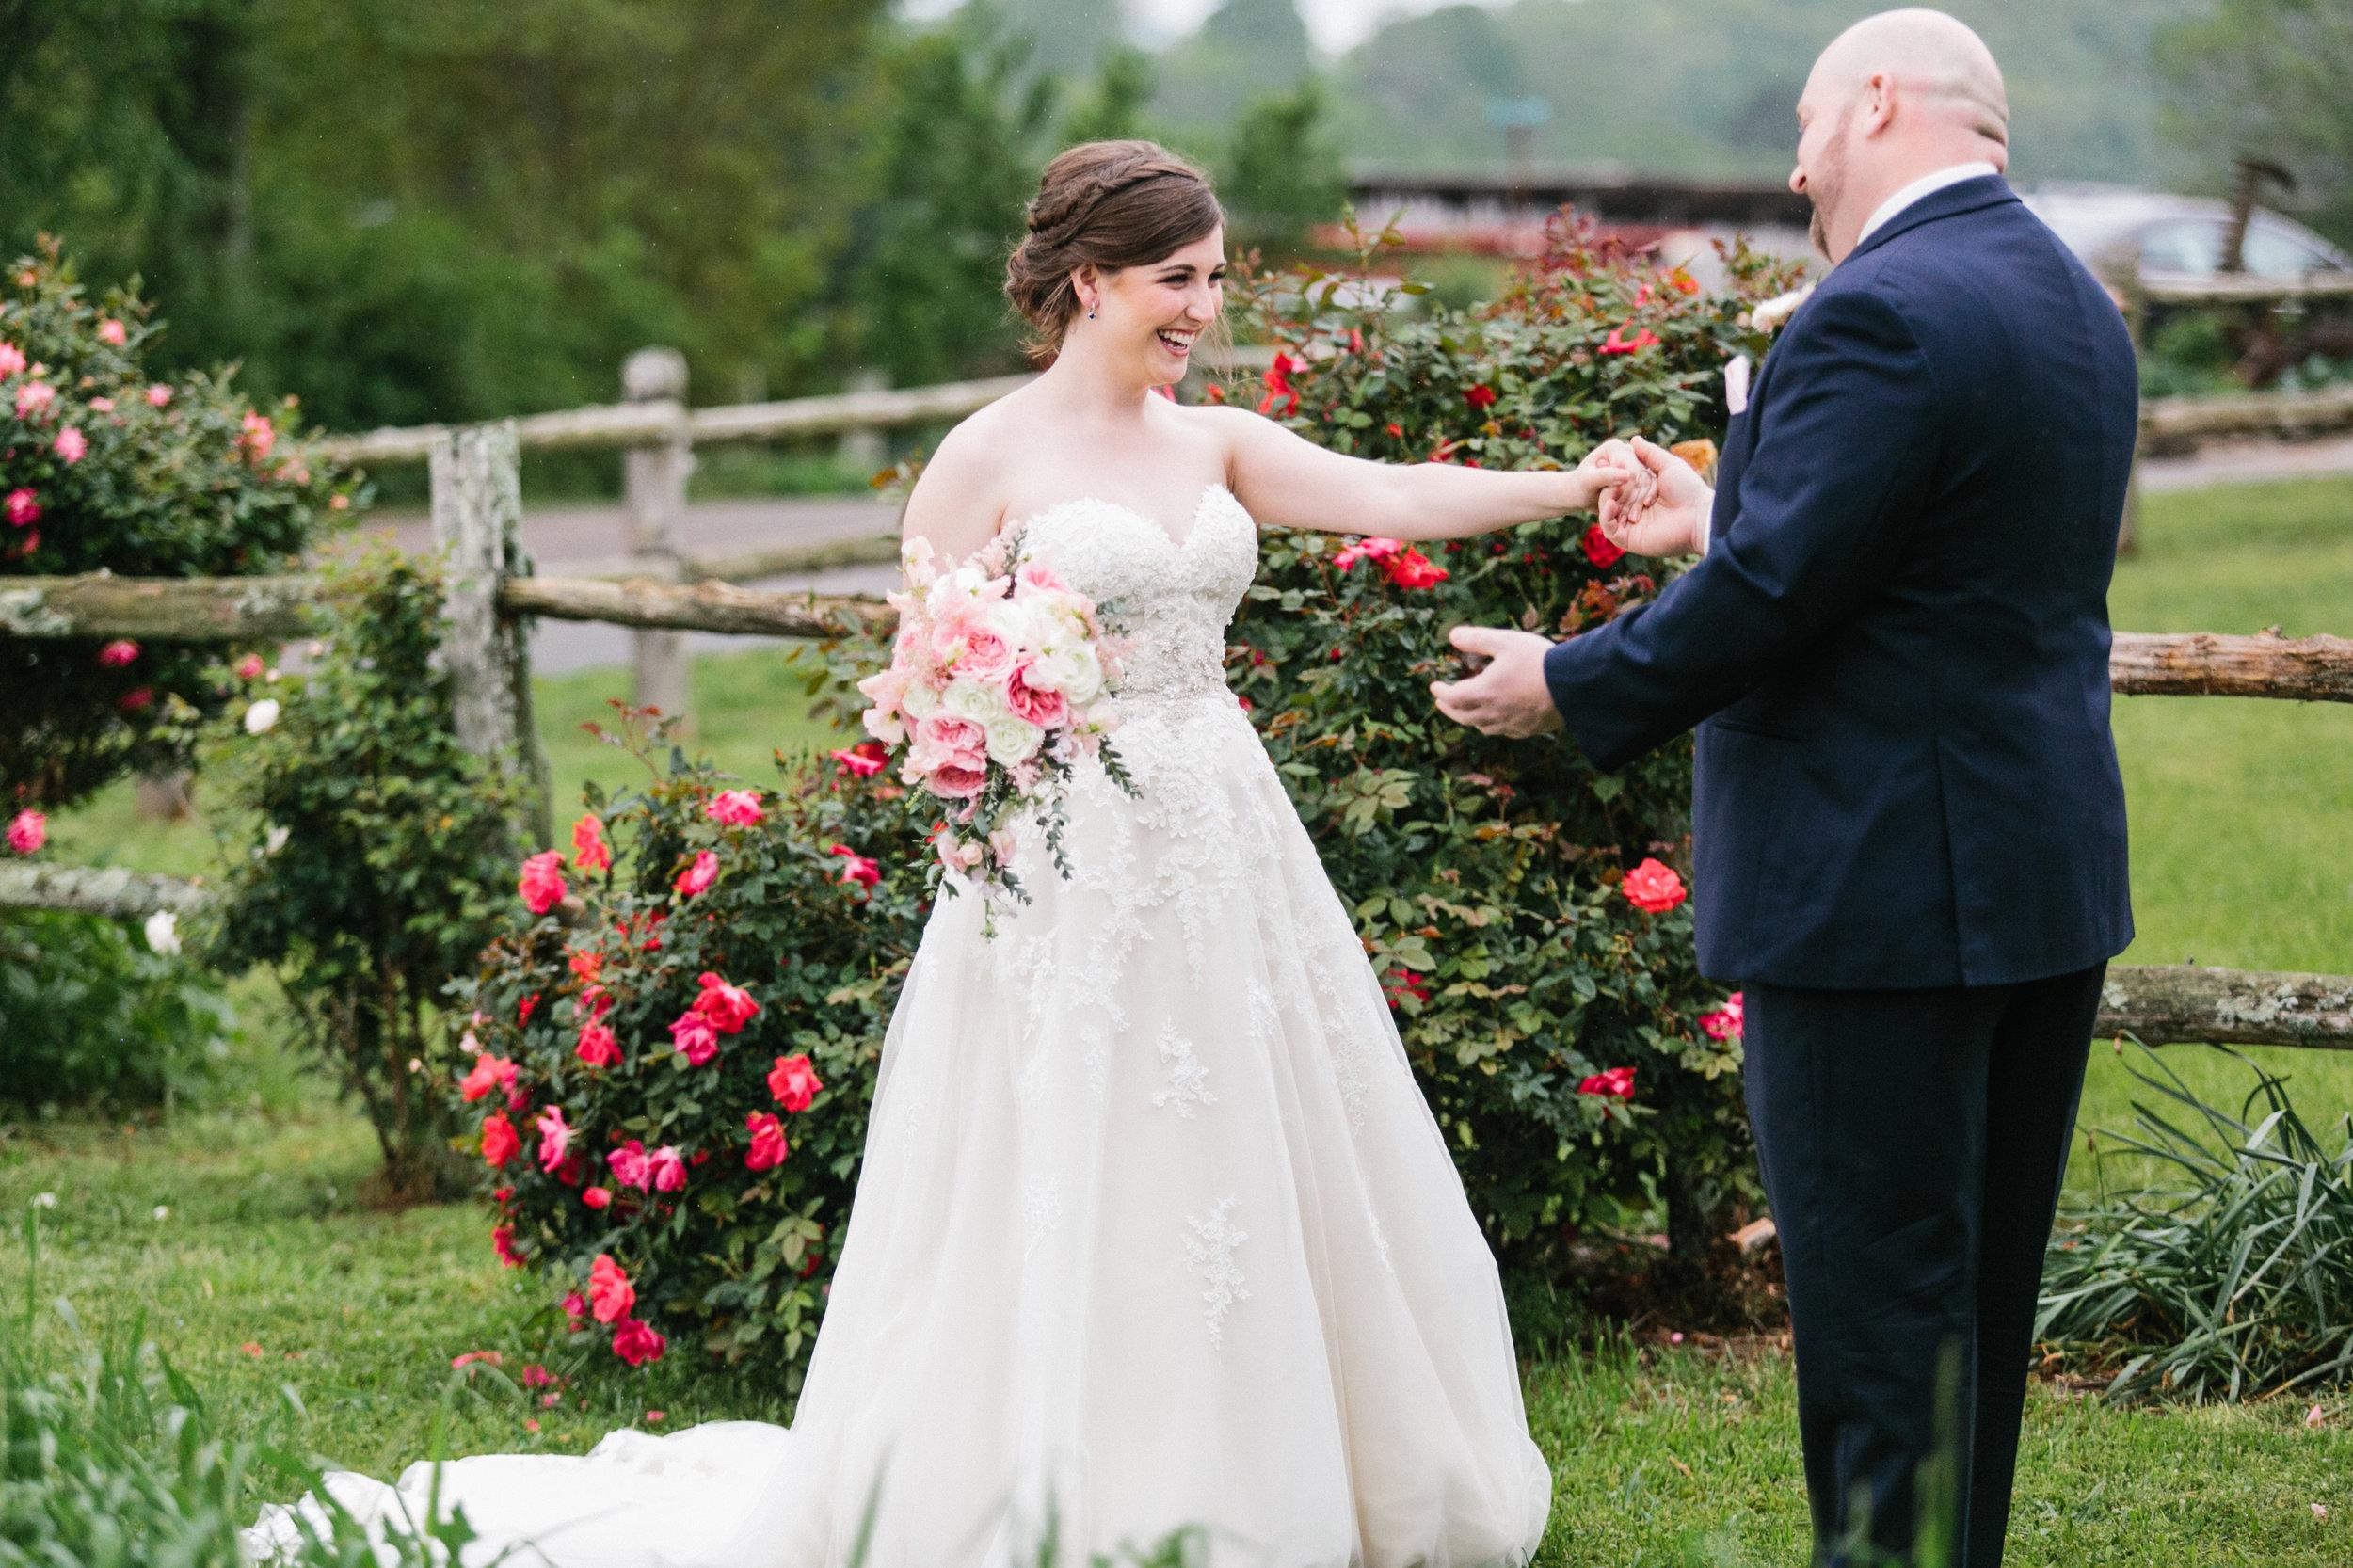 Lydia_johnathan_Wedding_Abigail_Malone_Photography-177.jpg